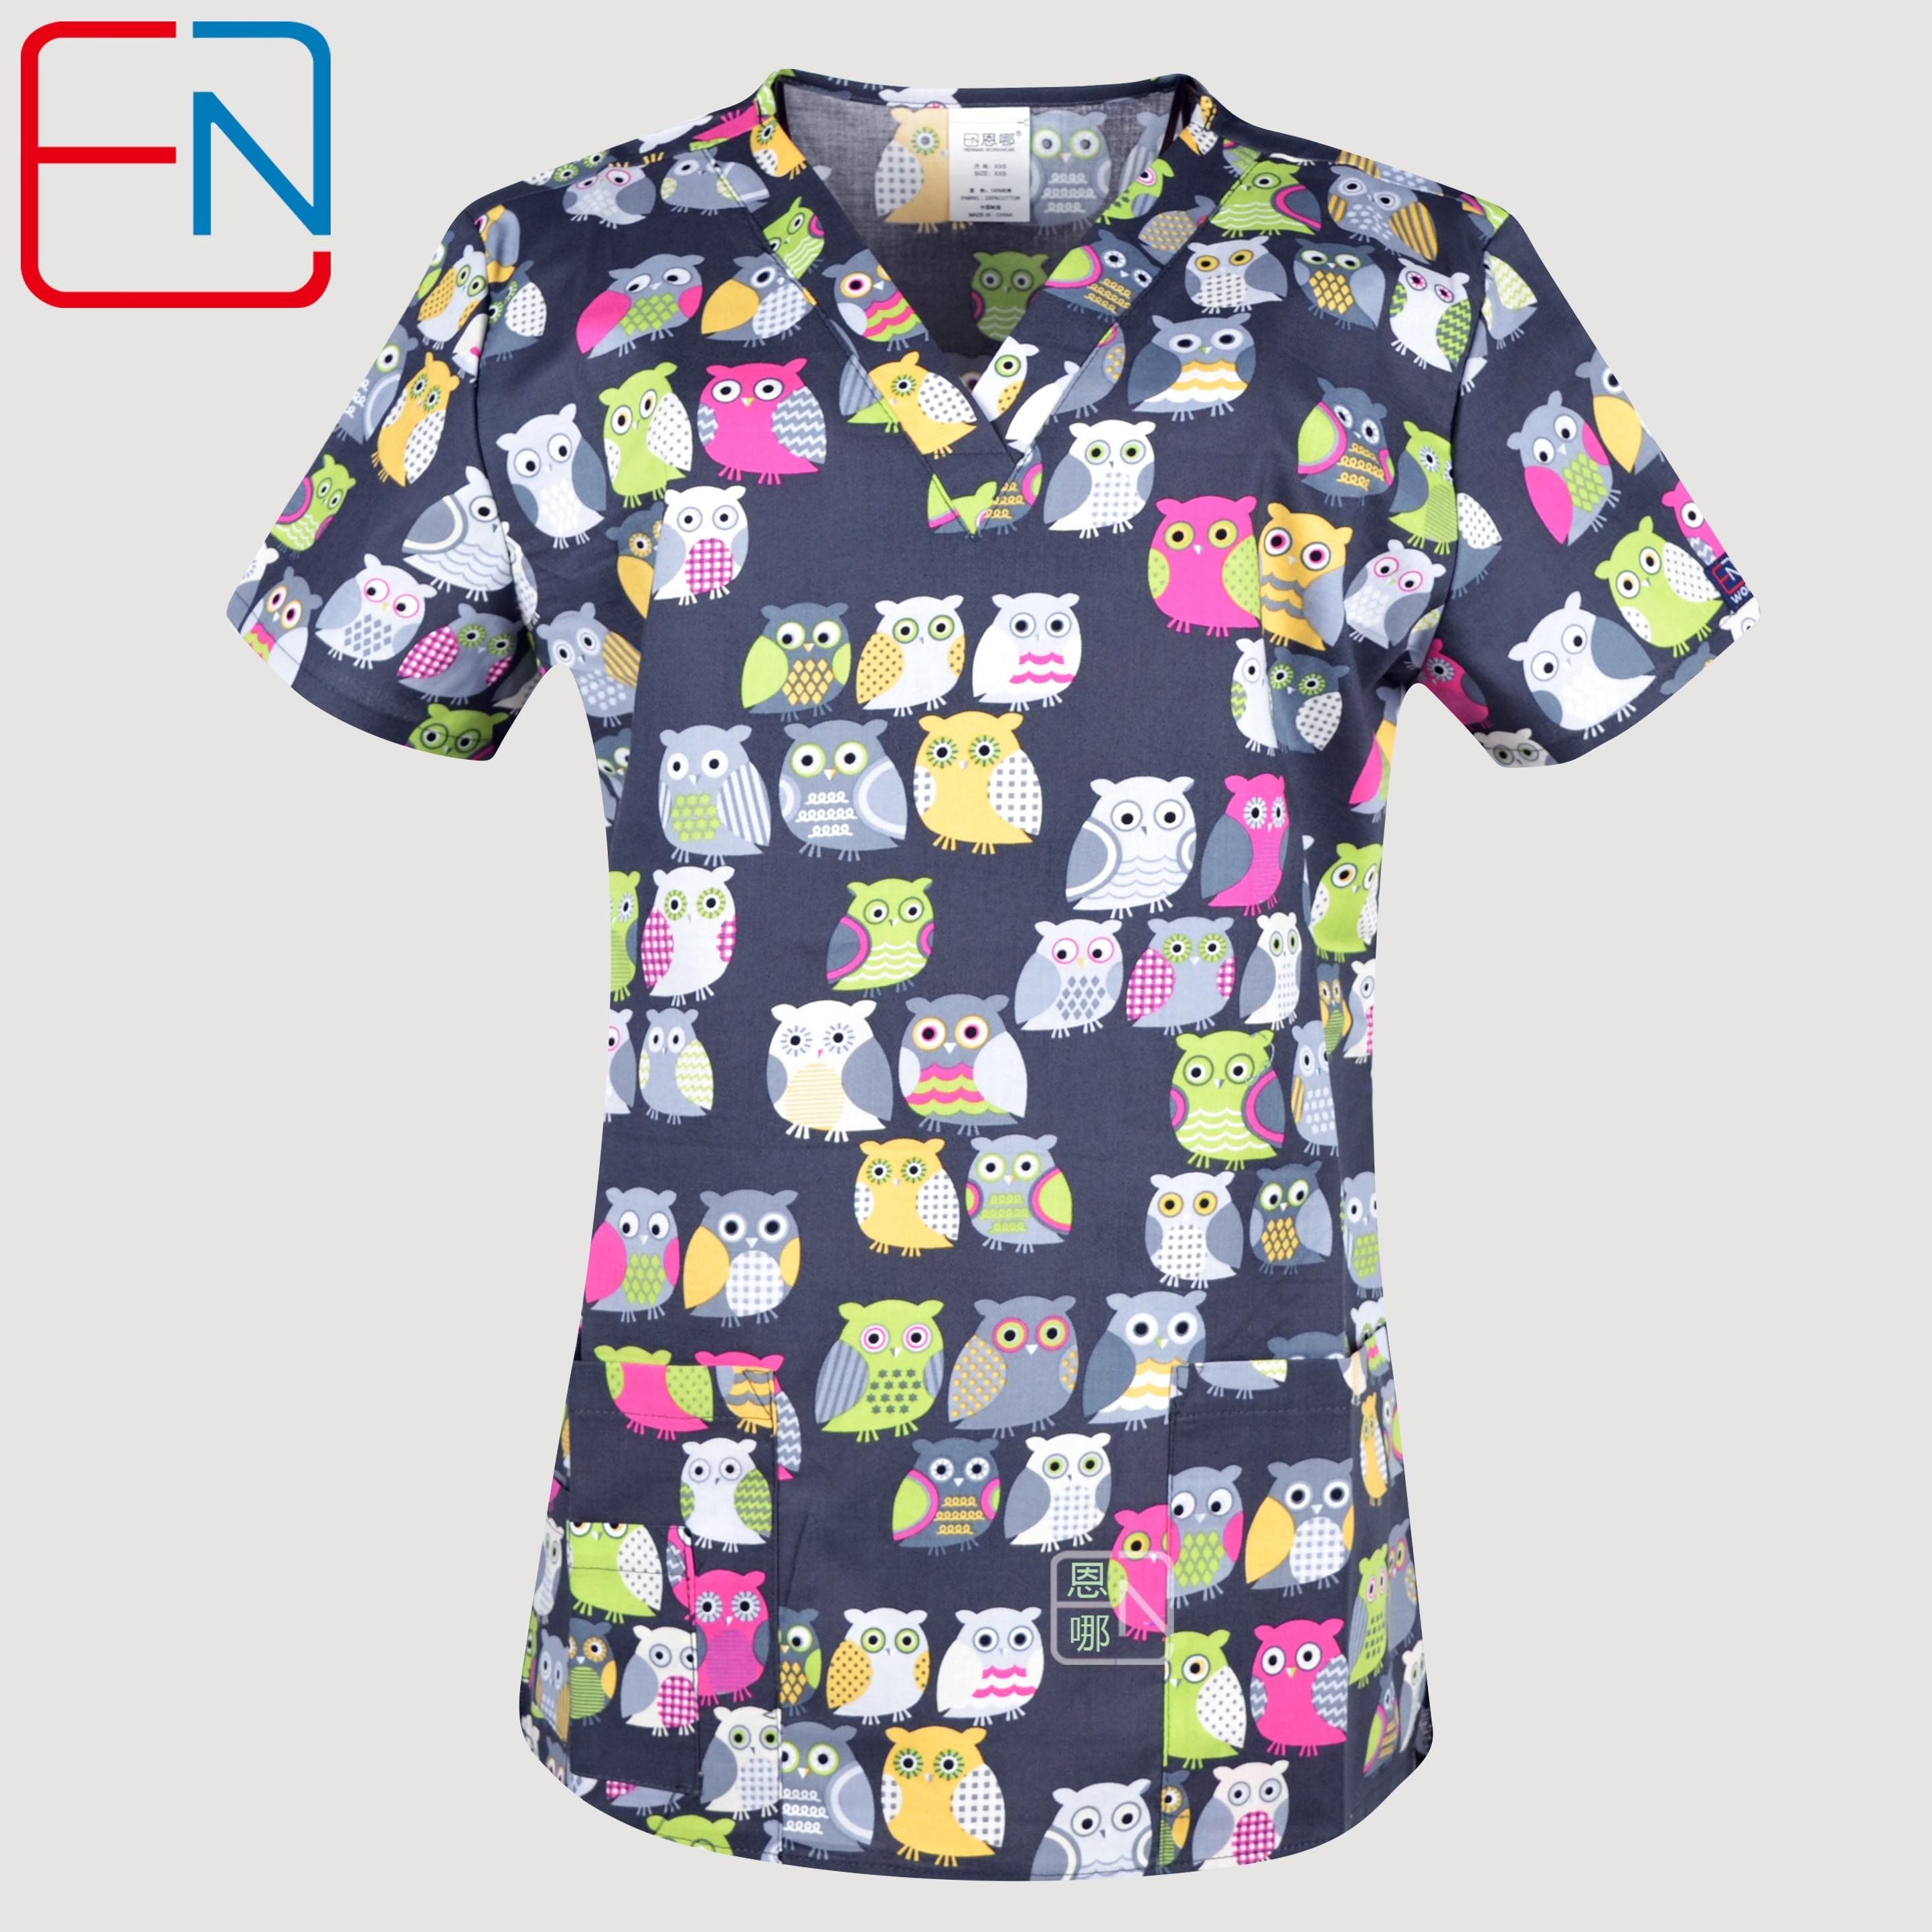 Hennar Women Print Medical Uniform Scrubs Tops Nurse Nursing Clinic Accessories Hospital Medico Clothing Surgical Suit